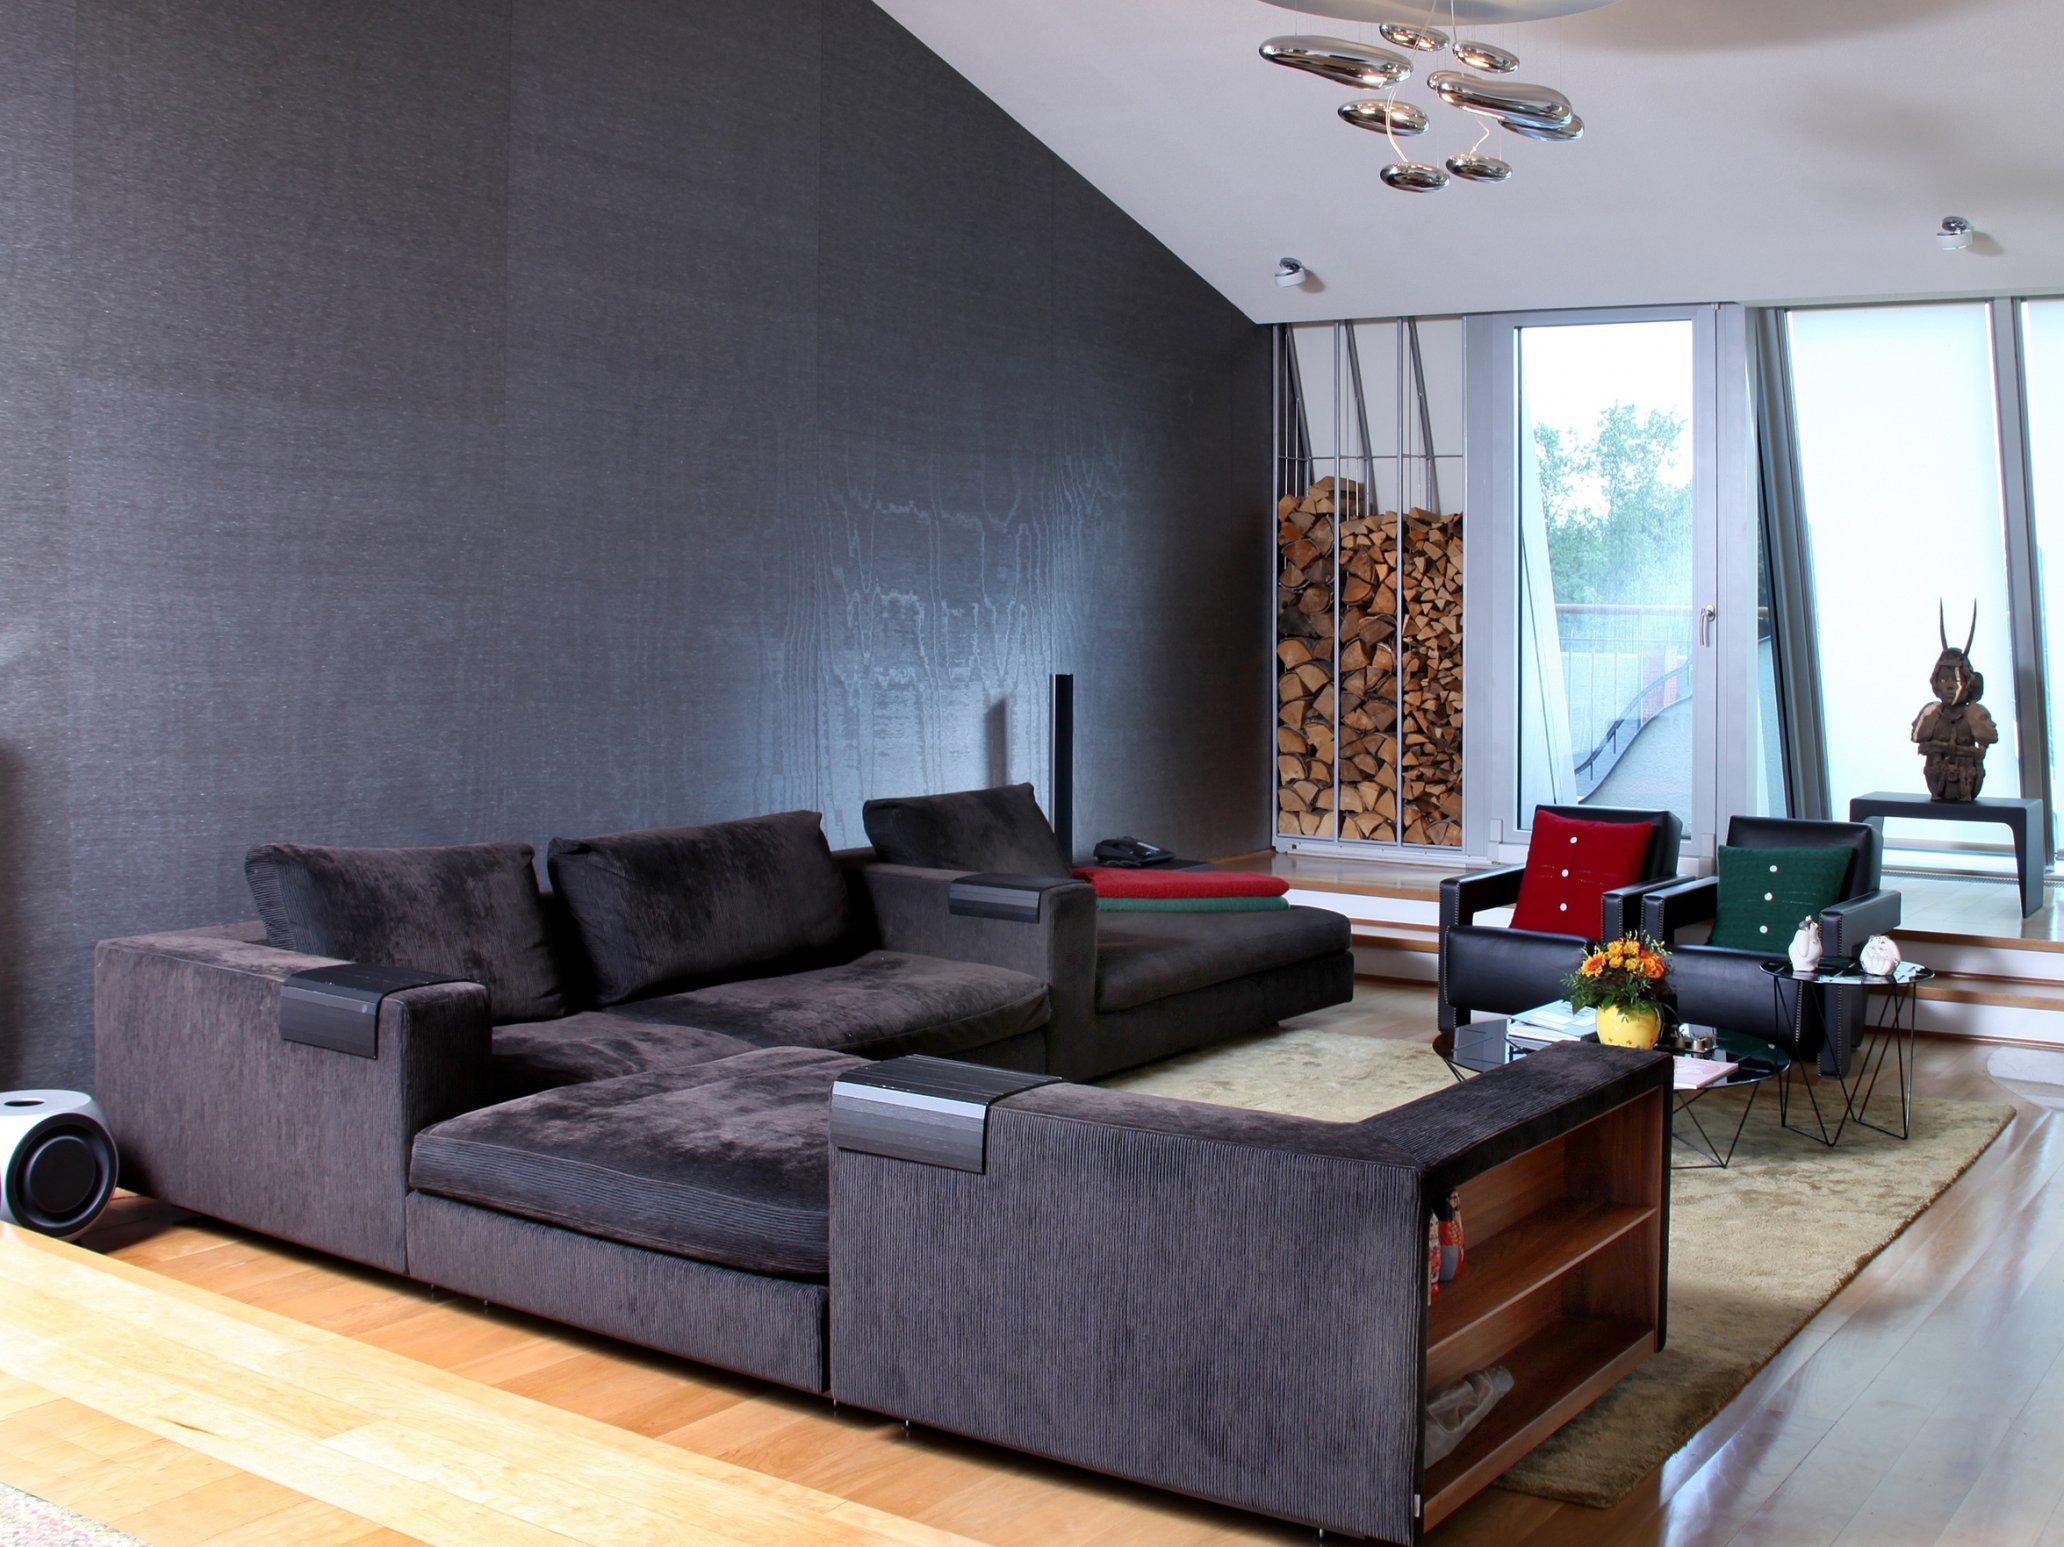 Penthouse Chemnitz Lounge